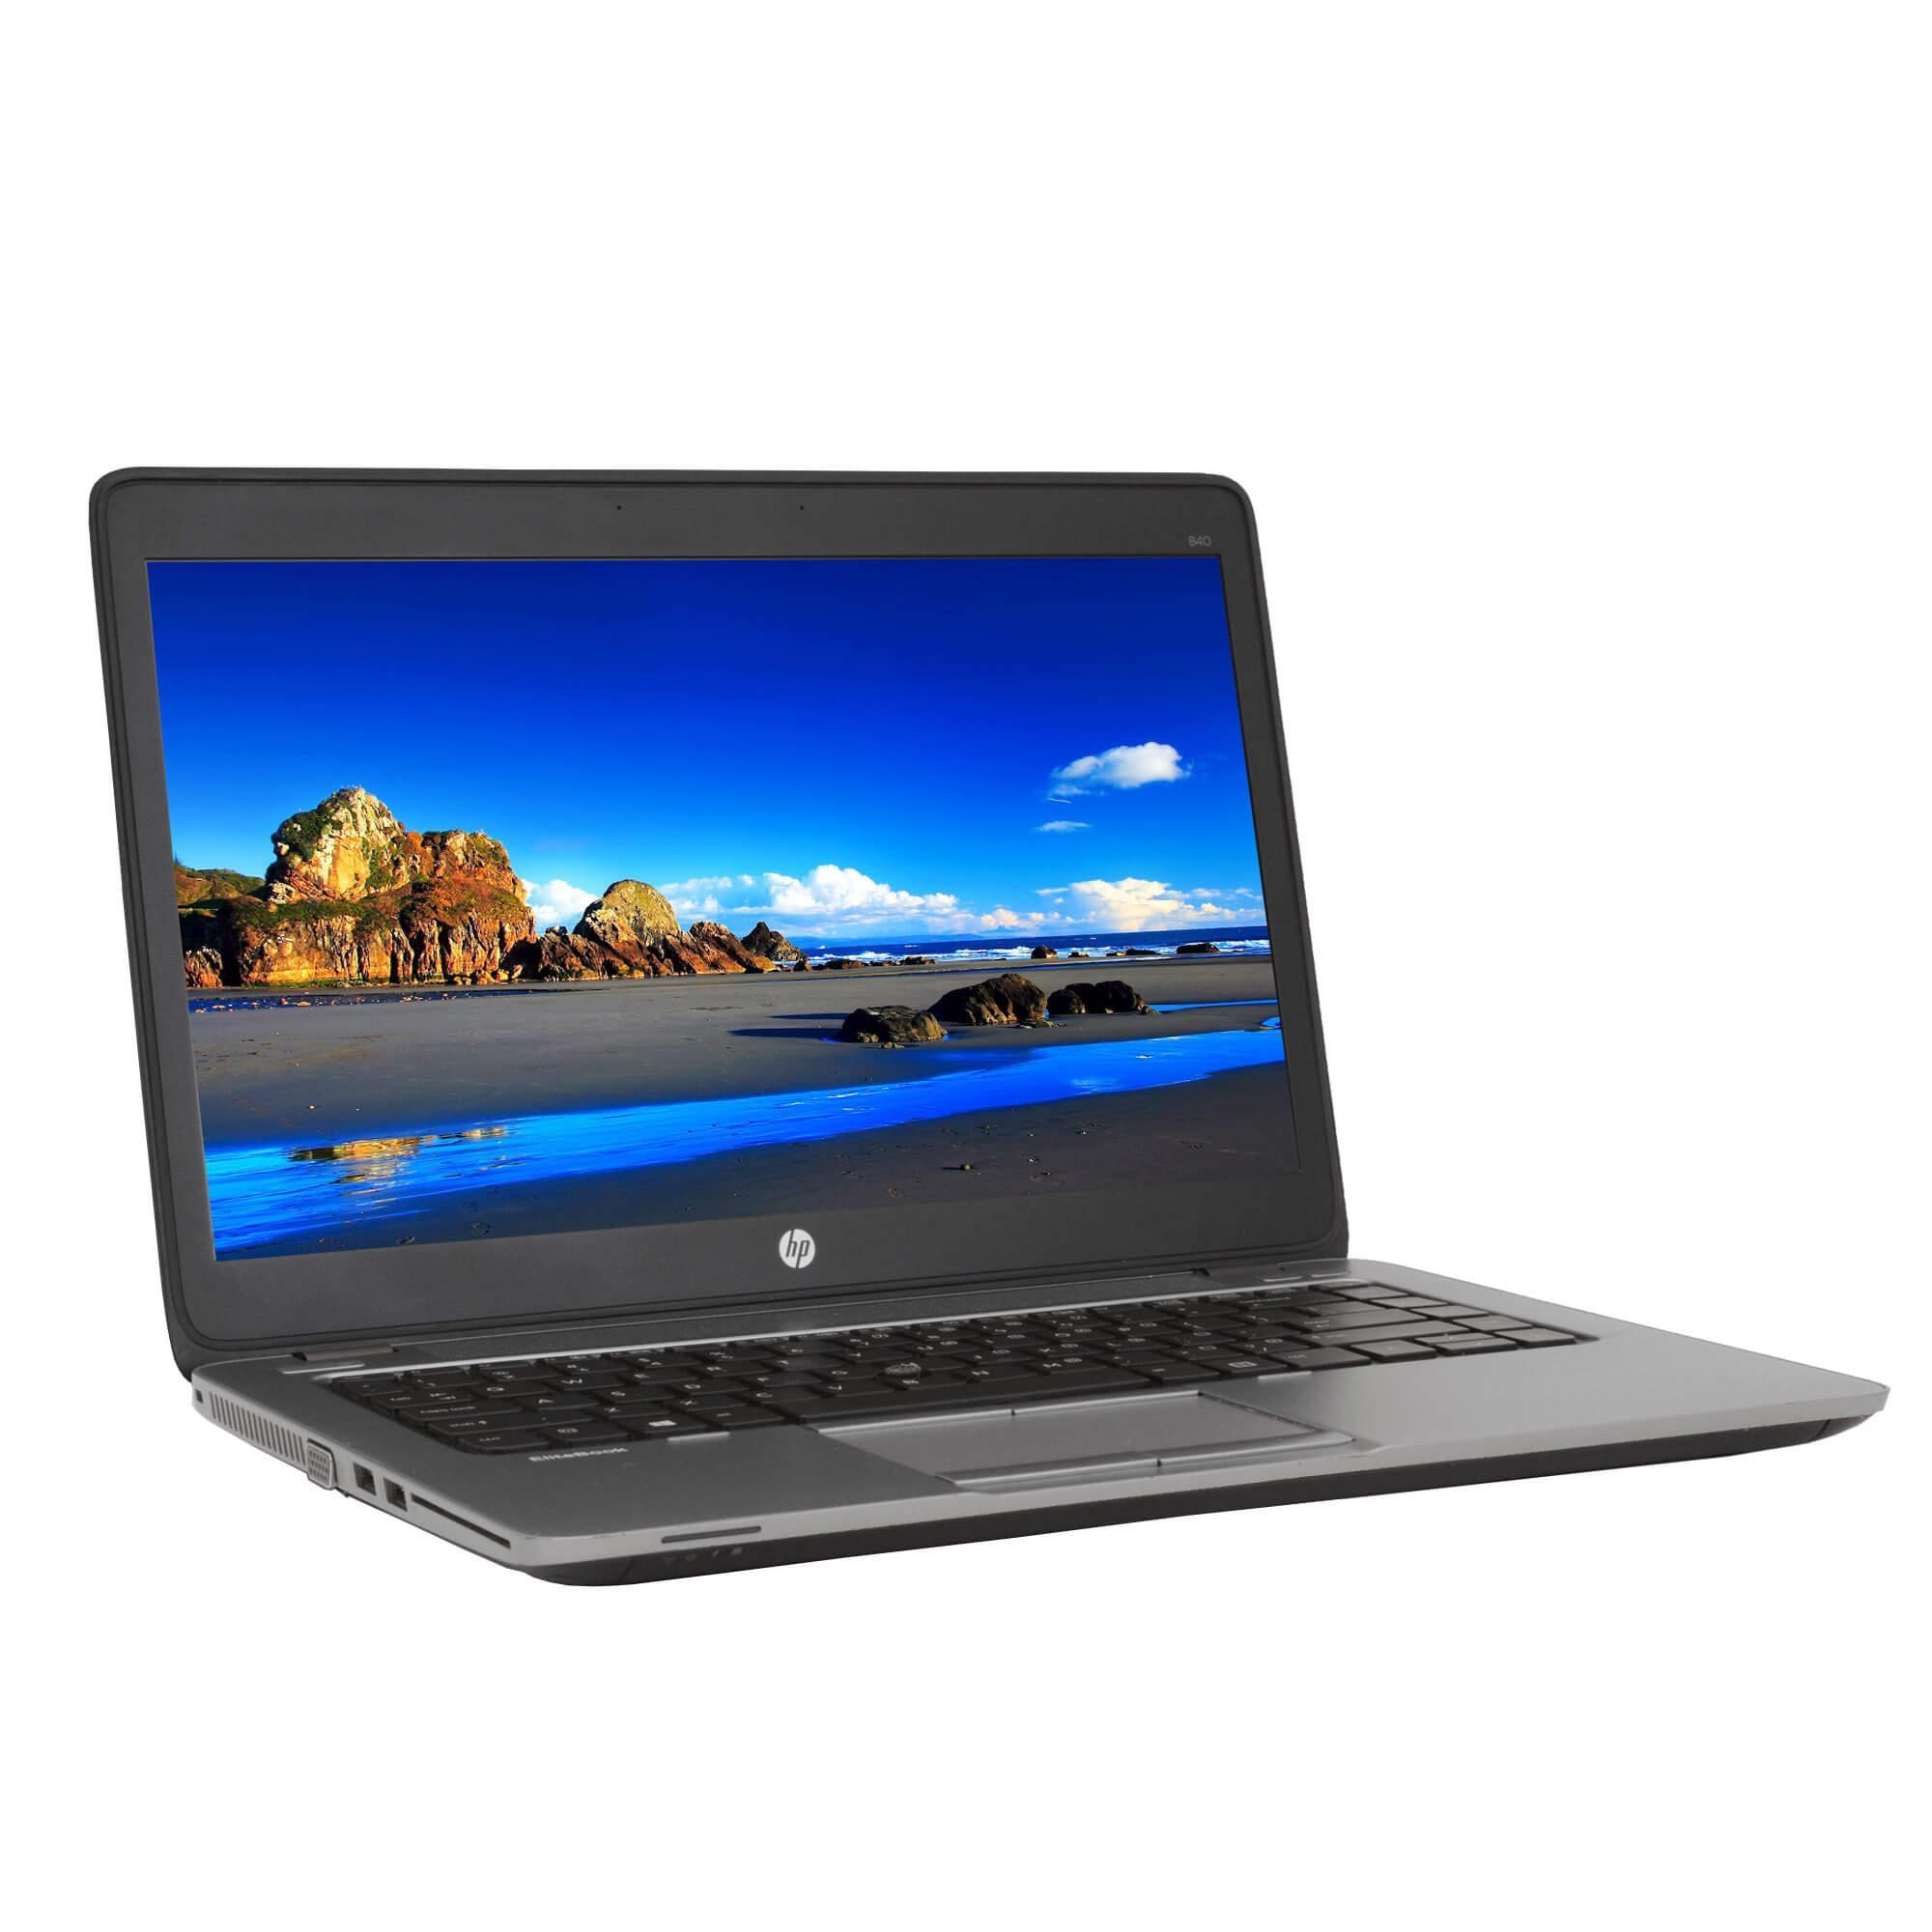 Hp EliteBook 840 G2 14-inch (2015) - Core i5-5200U - 8 GB - SSD 256 GB